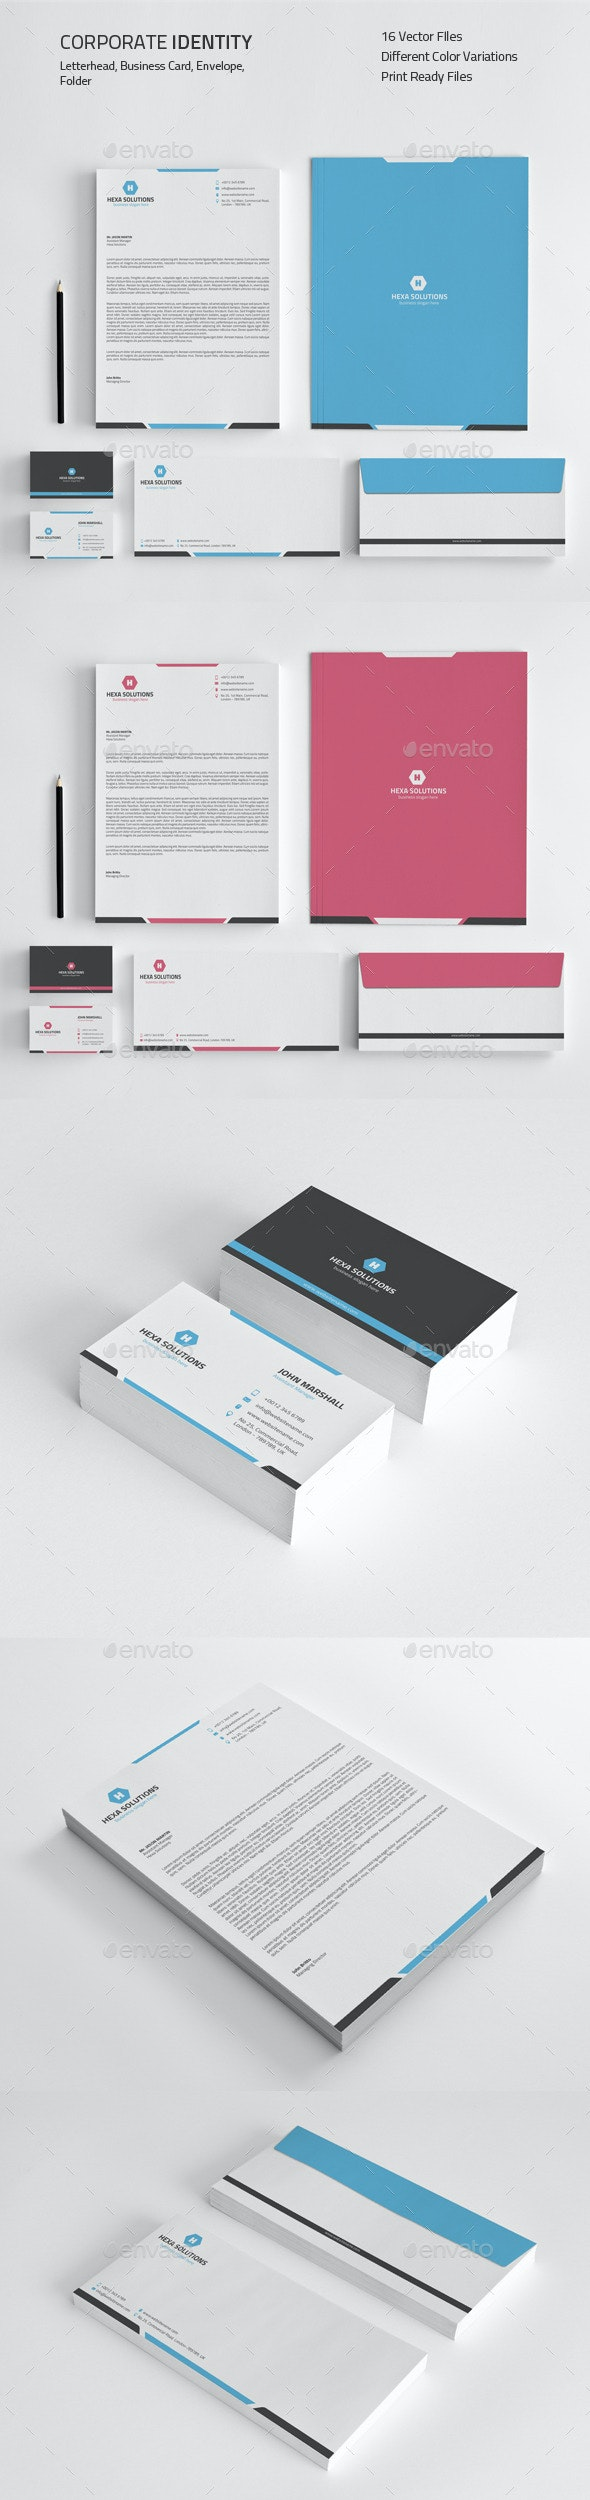 Corporate Identity 01 - Stationery Print Templates